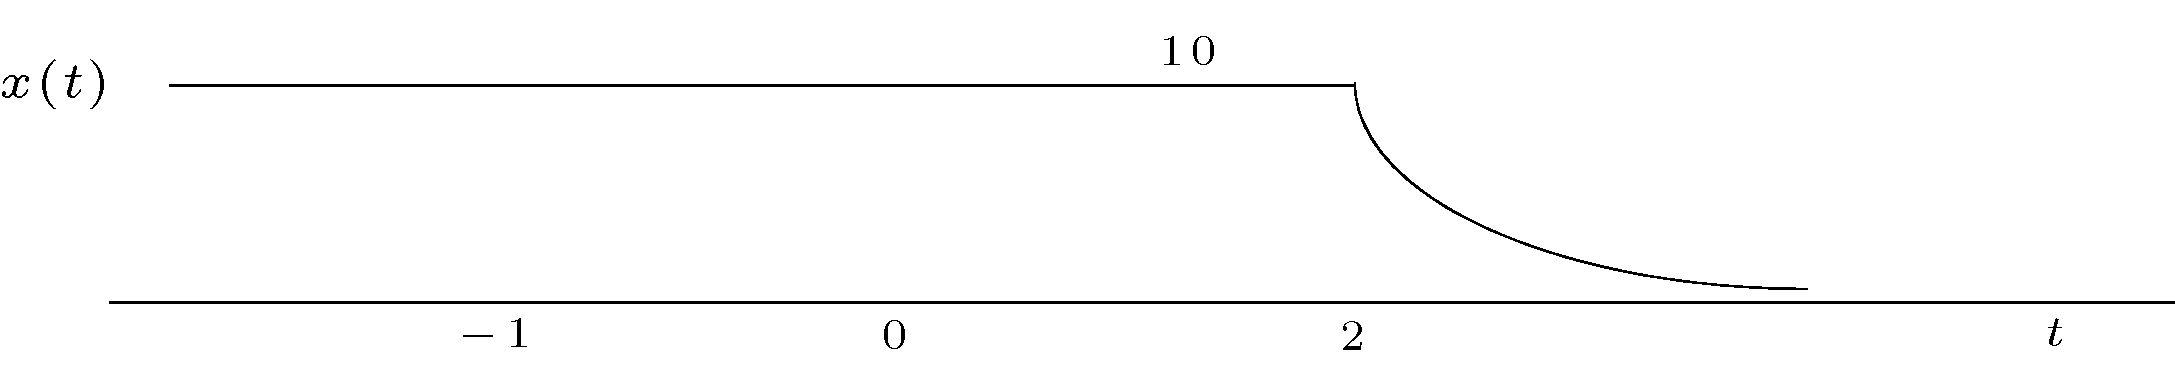 ch1.1.1.2.jpg